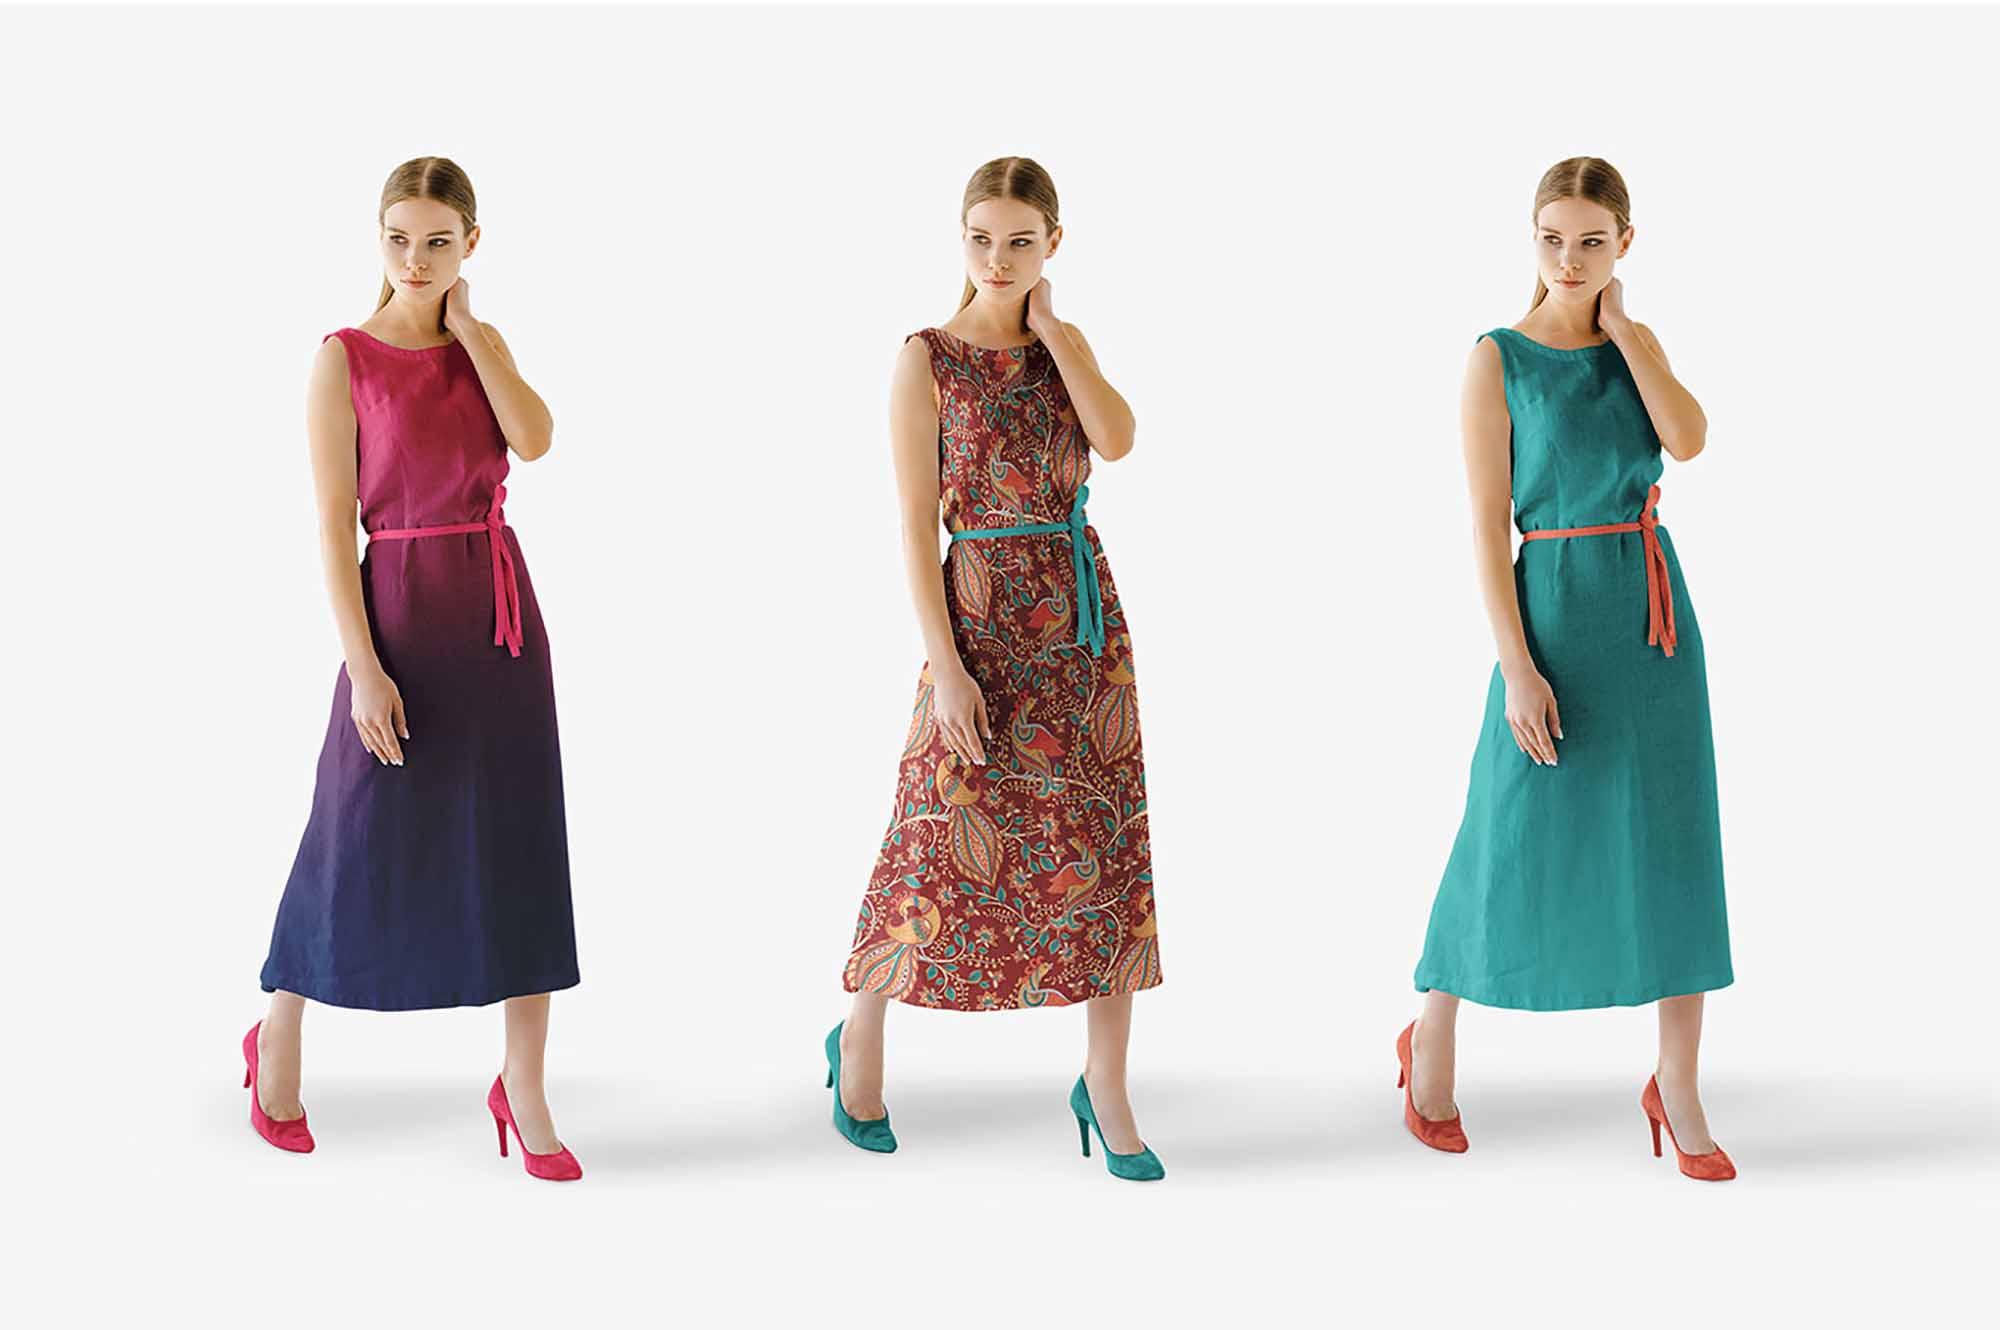 Summer Dress Mockup 3